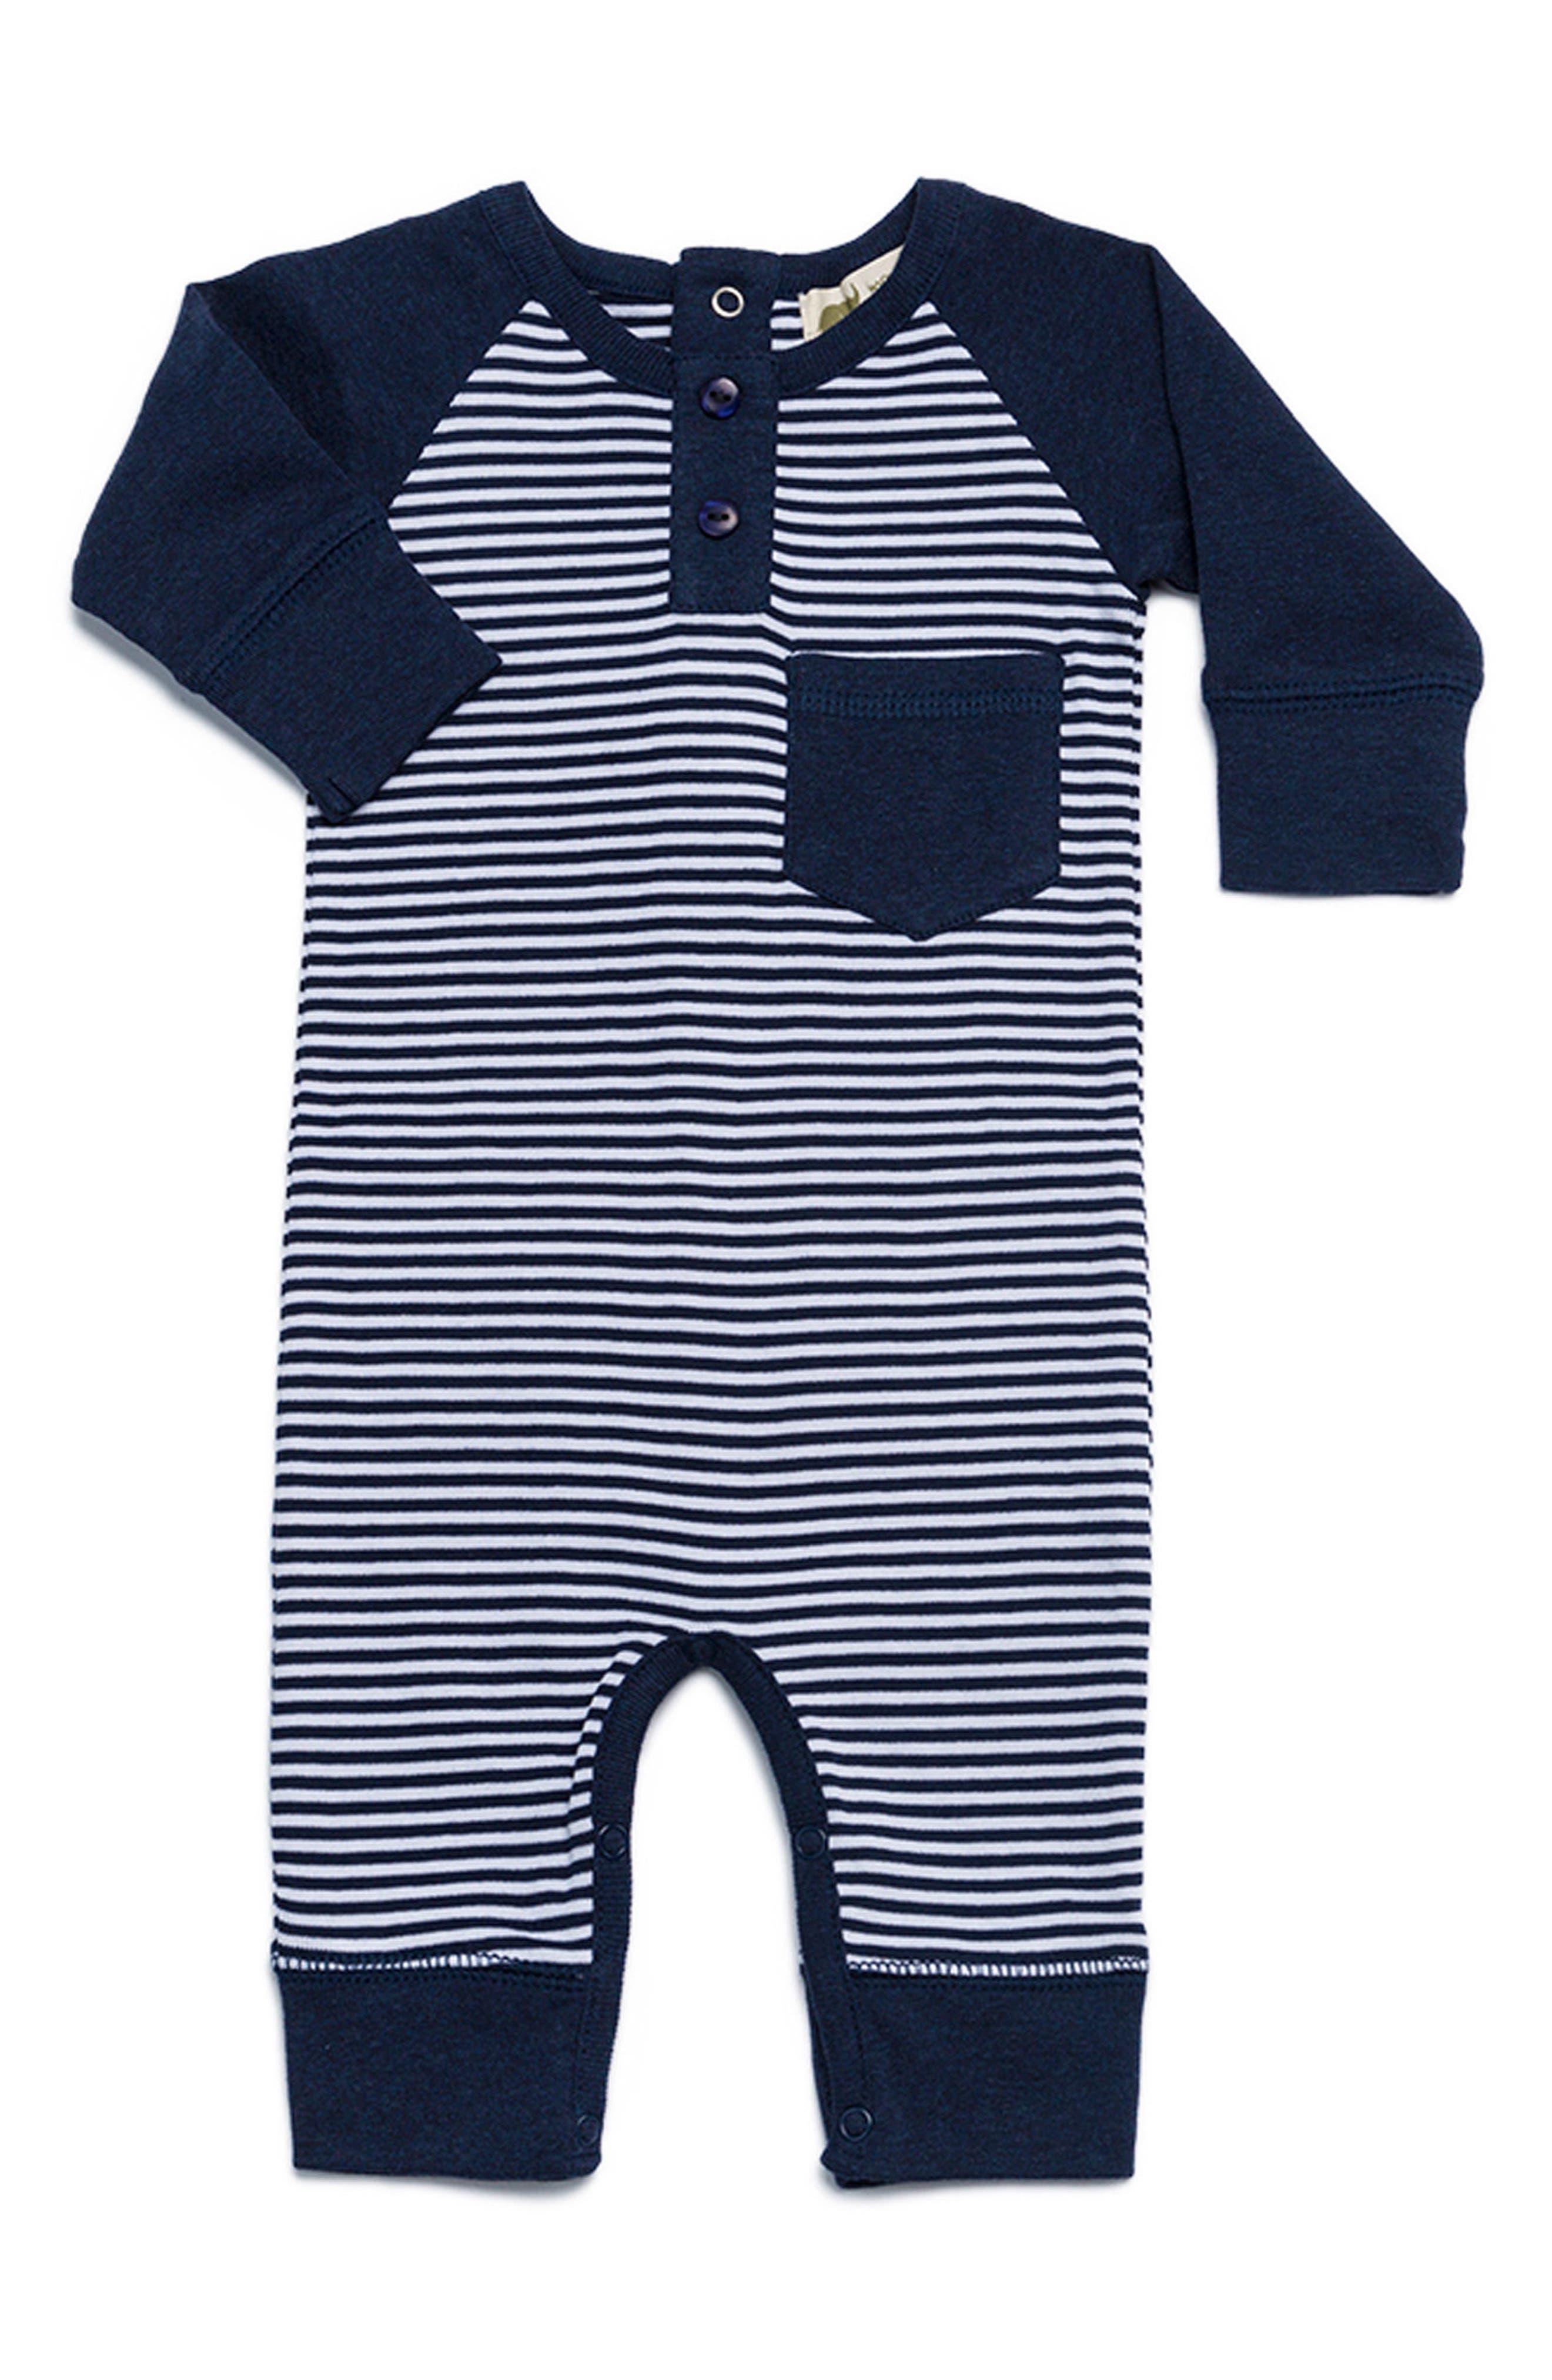 Henley Organic Cotton Romper,                             Main thumbnail 1, color,                             Navy Blue X White Stripe